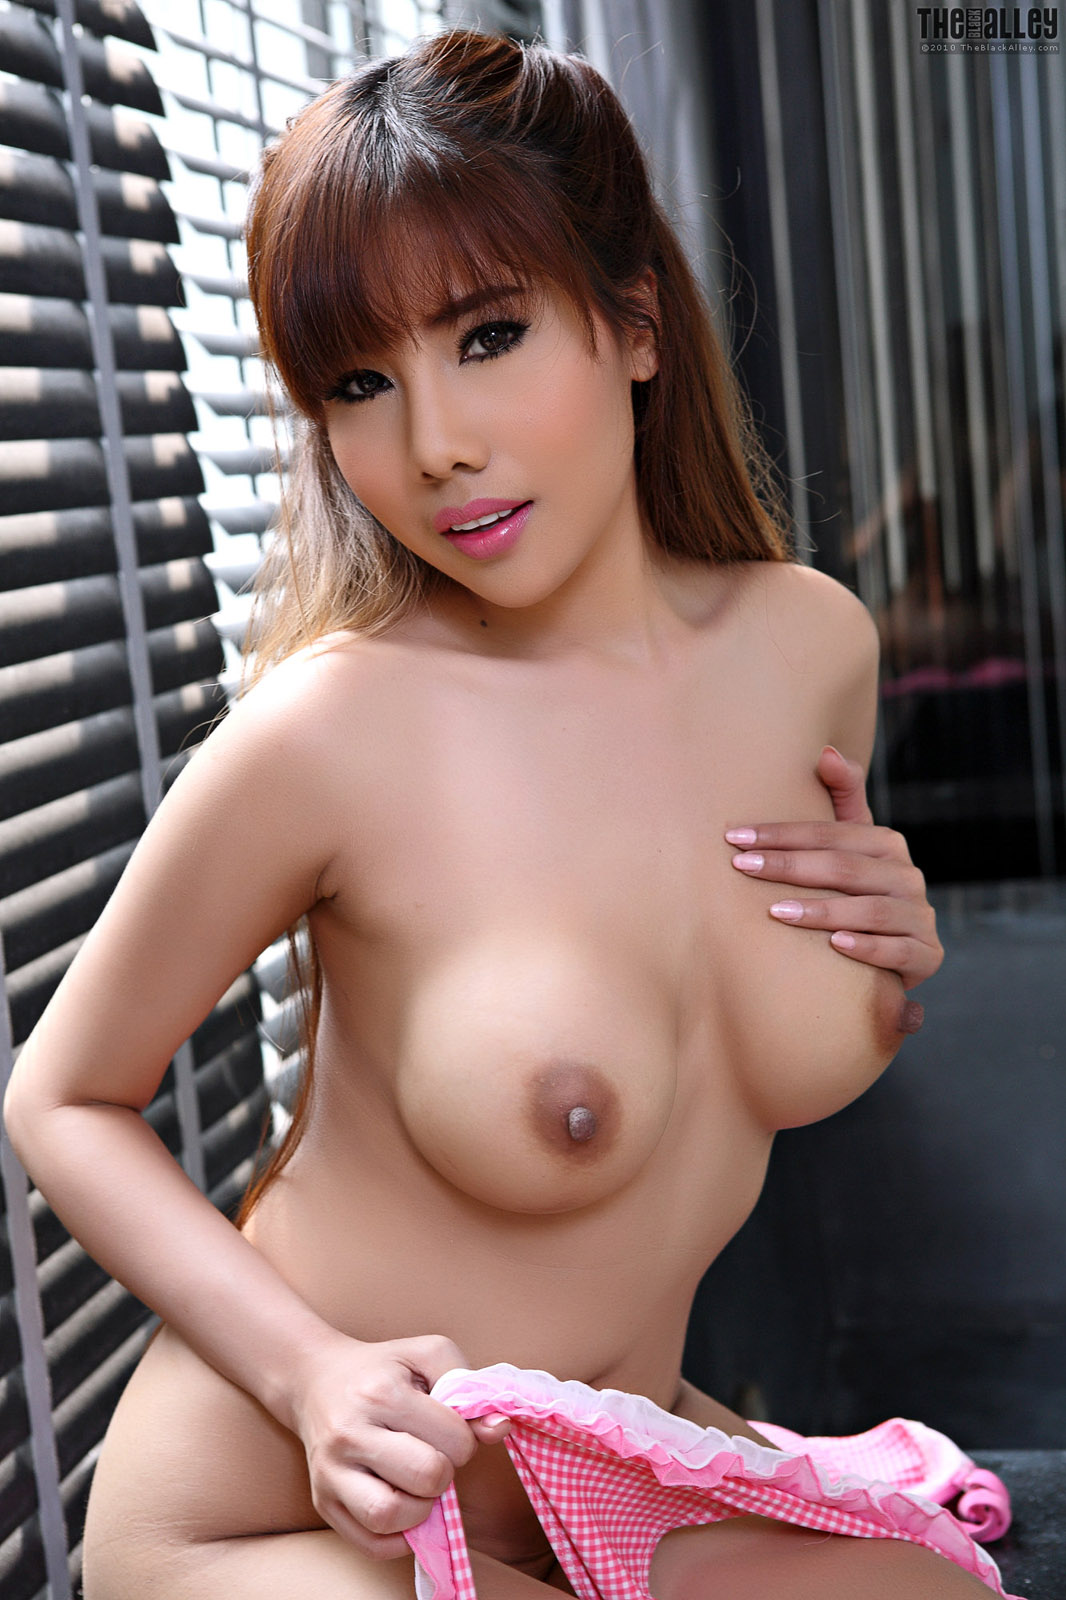 Alison angel porn trailor